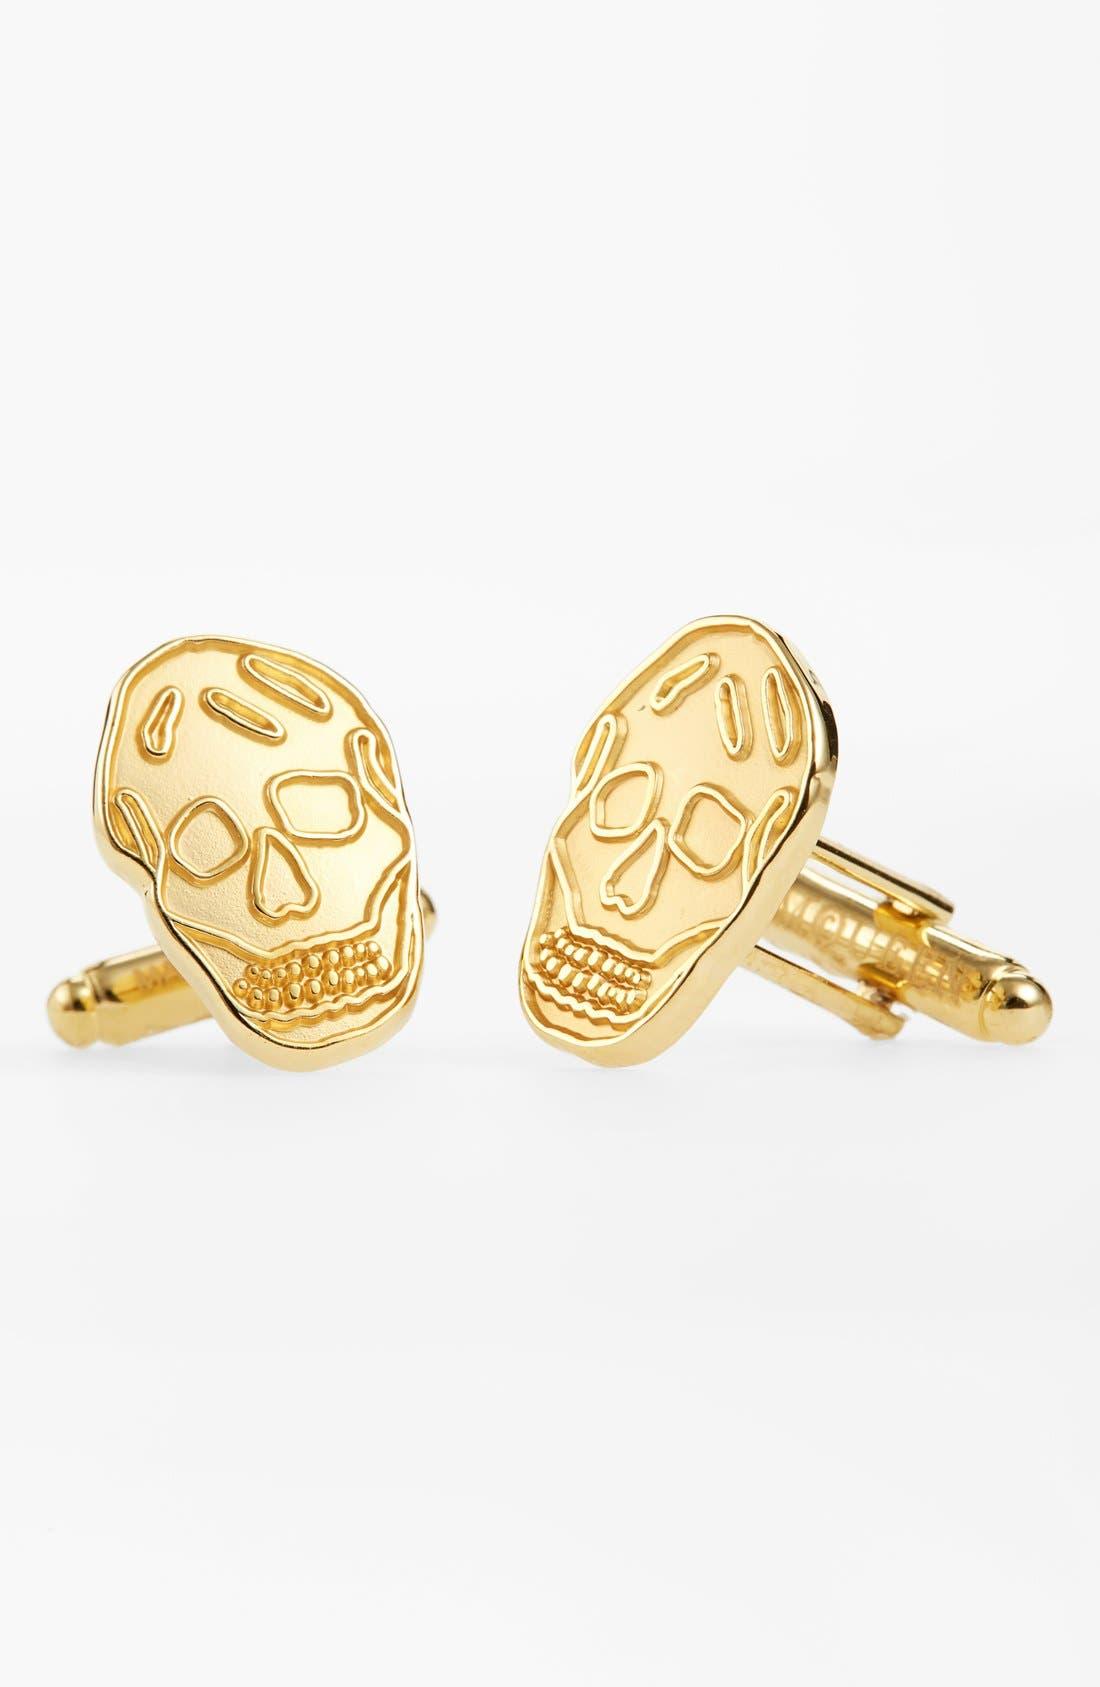 Alexander McQueen Brass Skull Cuff Links